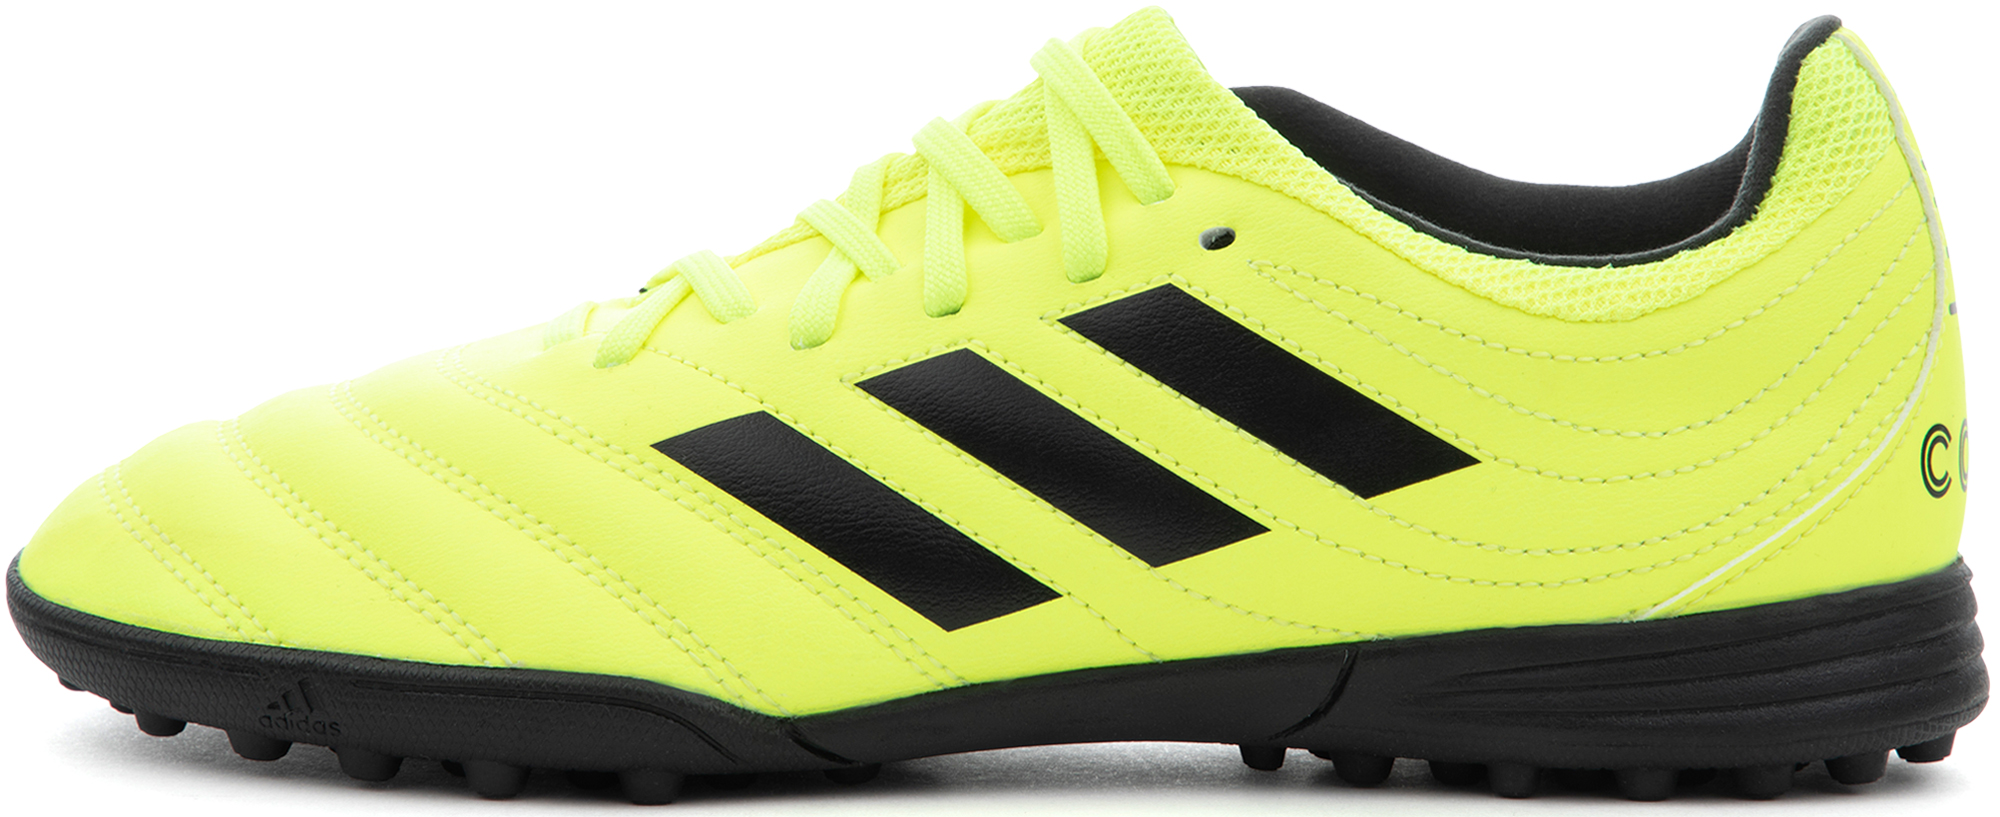 Adidas Бутсы детские Copa 19.3 TF, размер 37